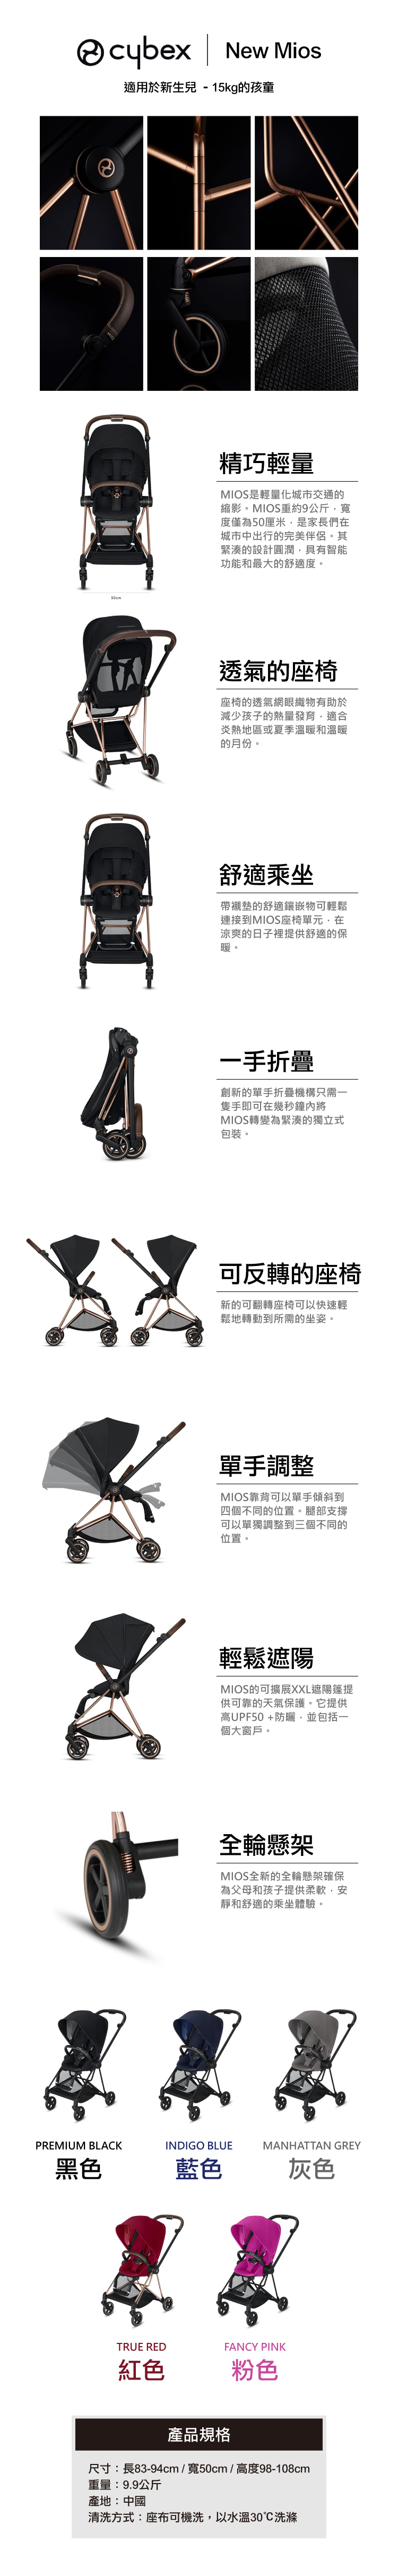 Cybex Mios輕便型4輪嬰兒手推車